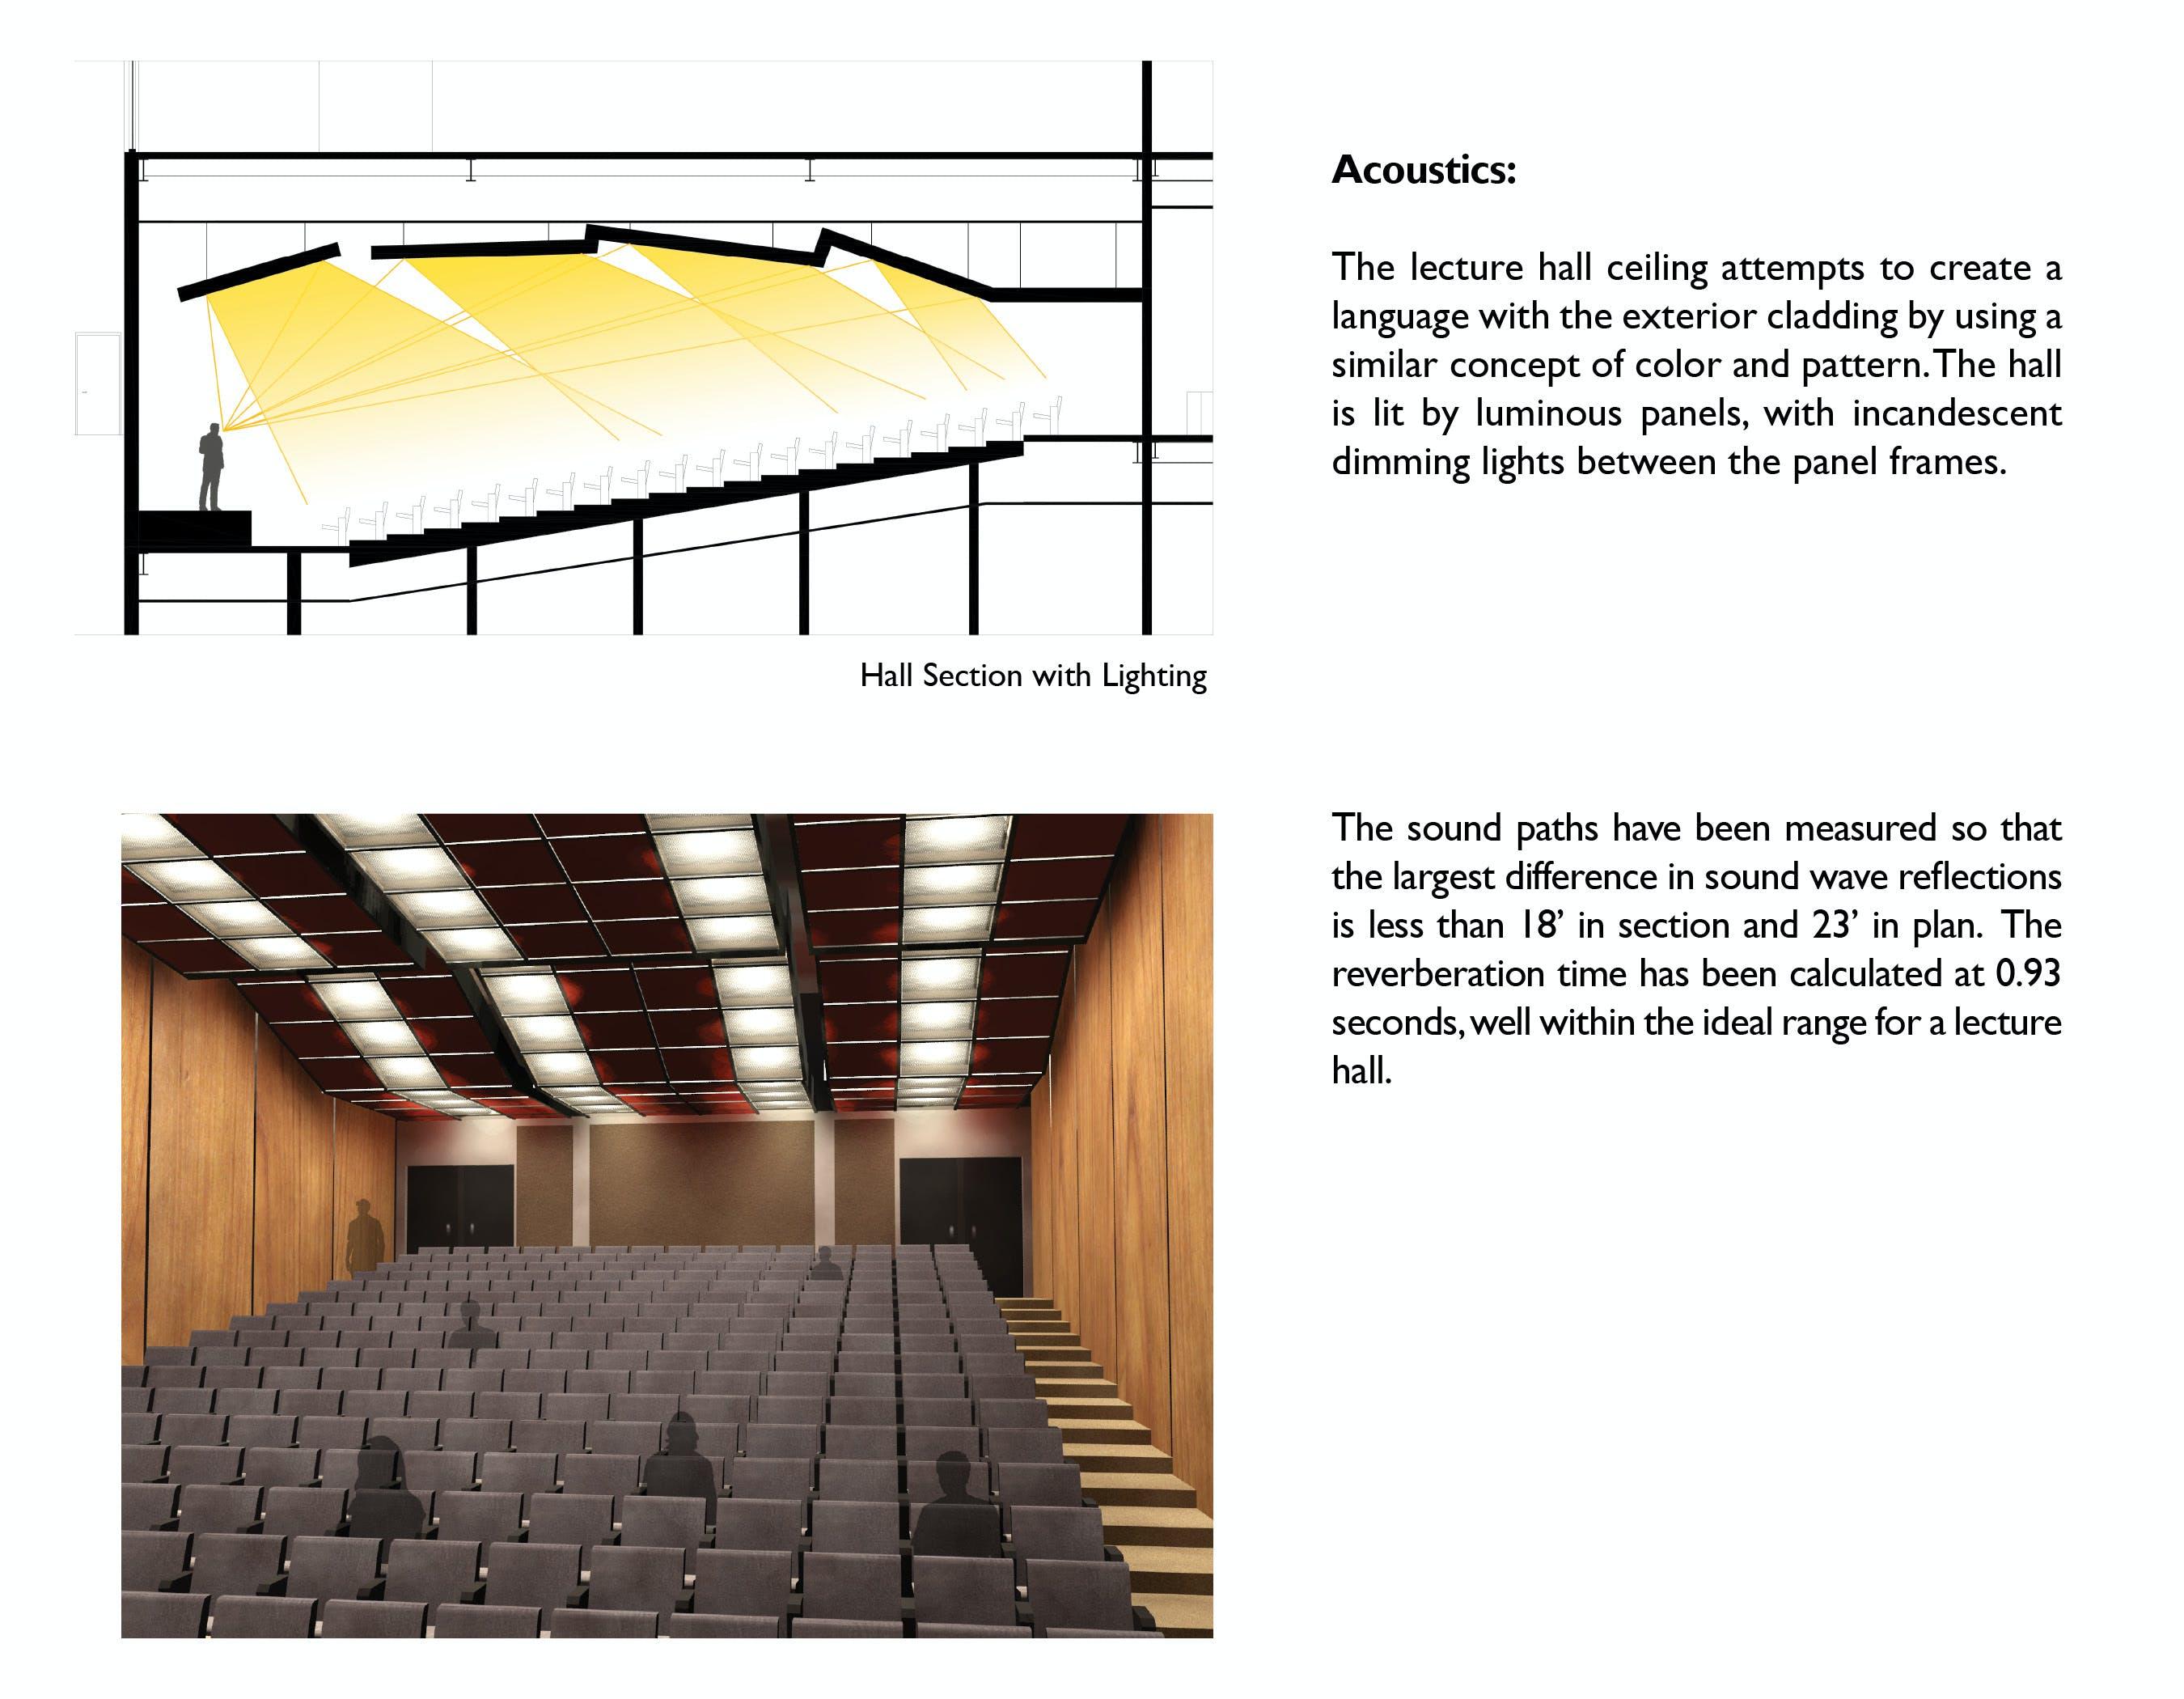 University Architectural Museum